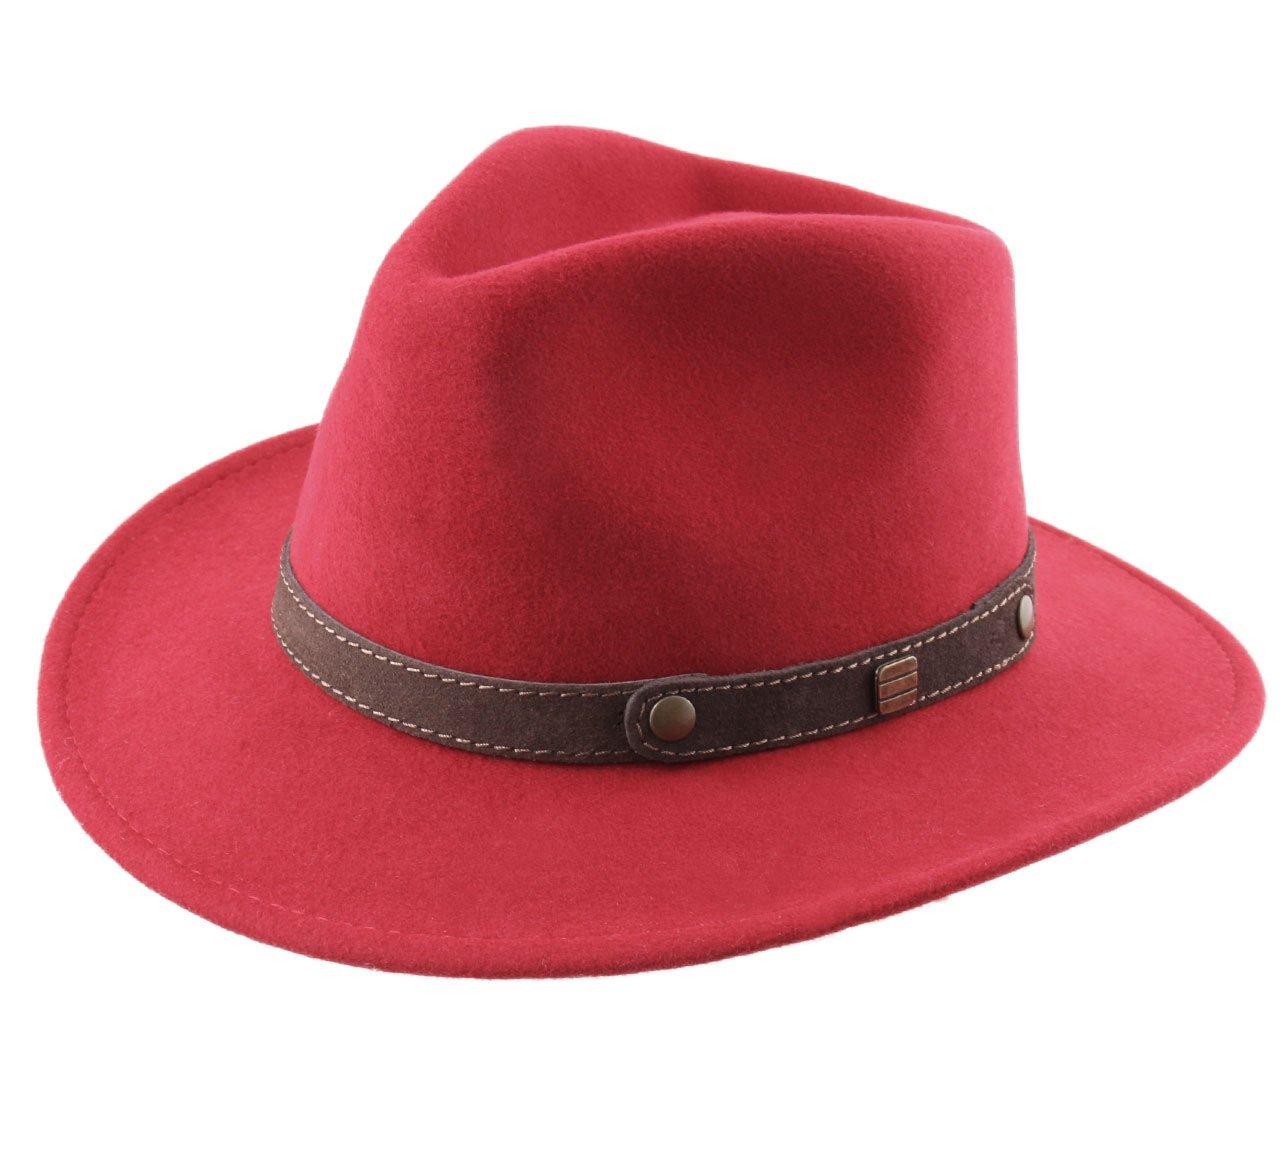 Classic Italy Men's Traveller II Wool Felt Fedora Hat